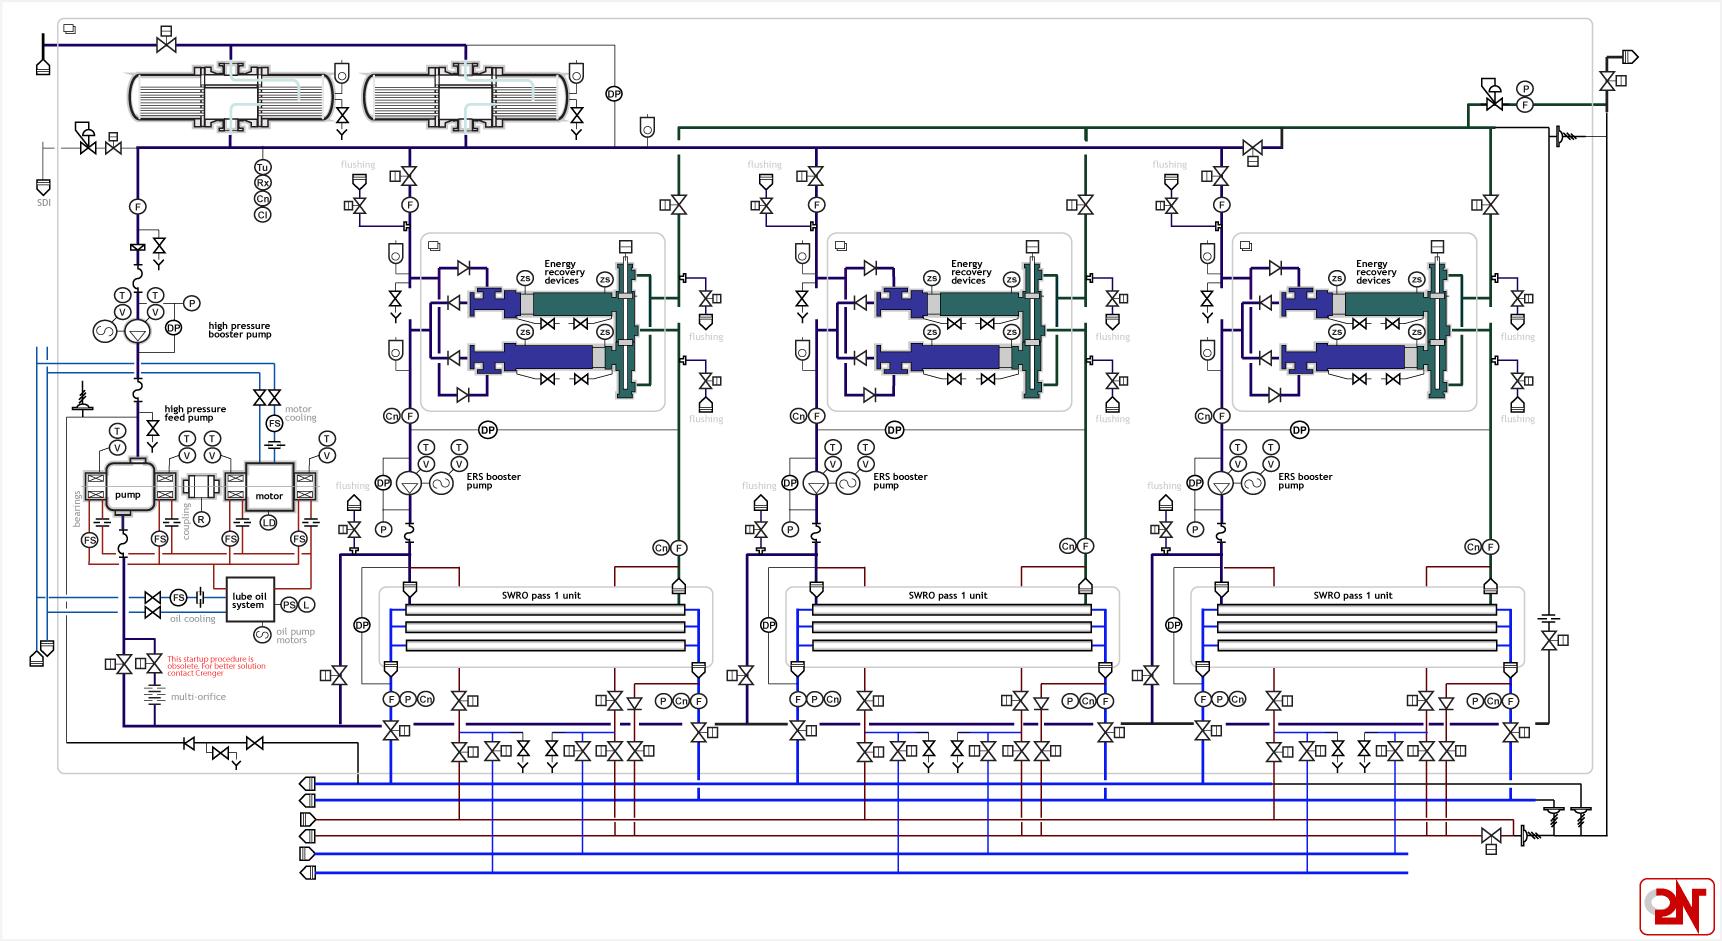 Digital Infrastructure Process Flow Diagram Ro Plant Swro